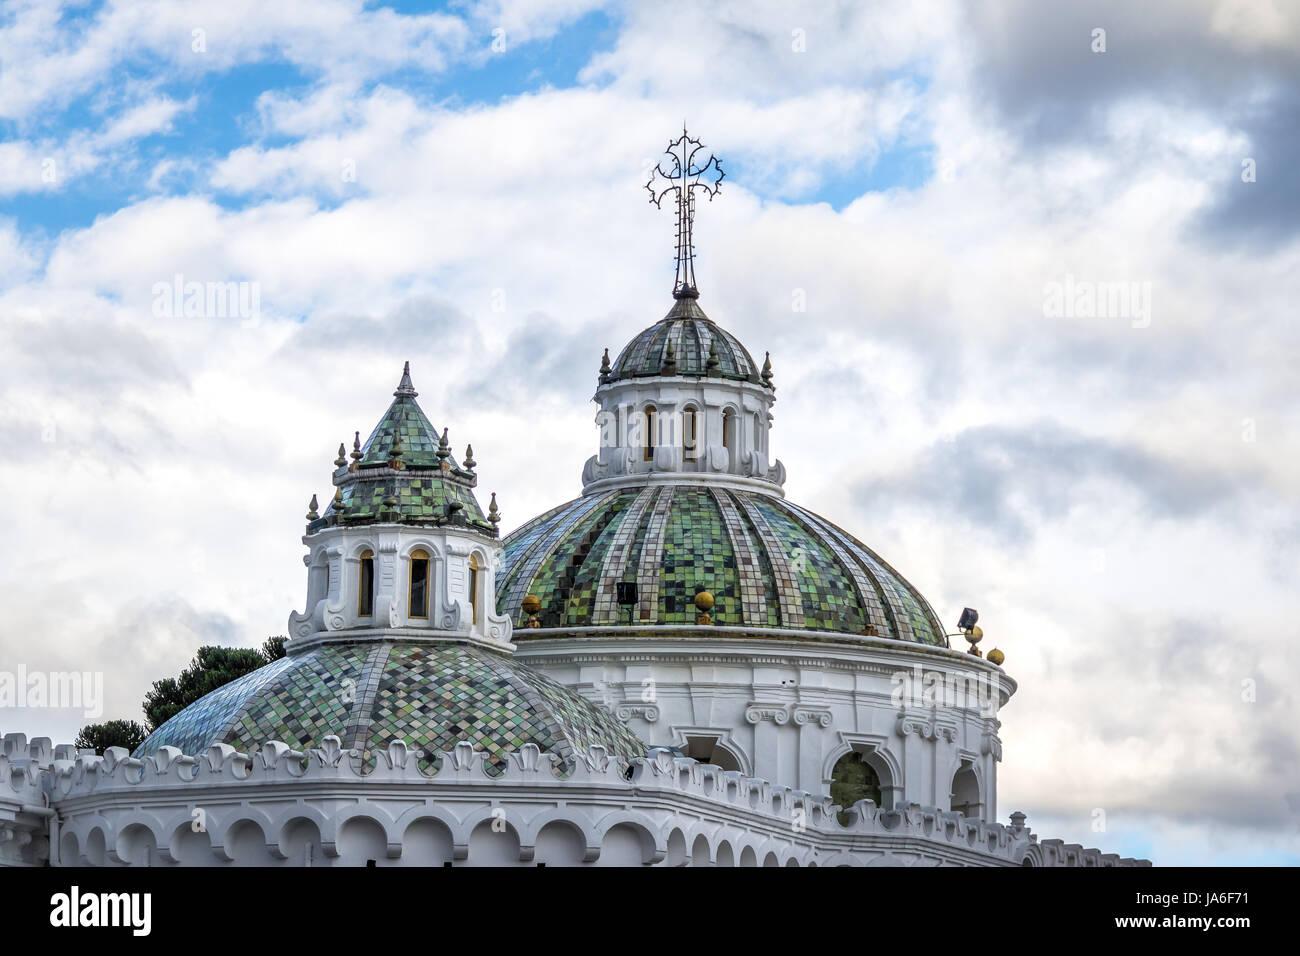 La cúpula de la Catedral Metropolitana - Quito, Ecuador Imagen De Stock